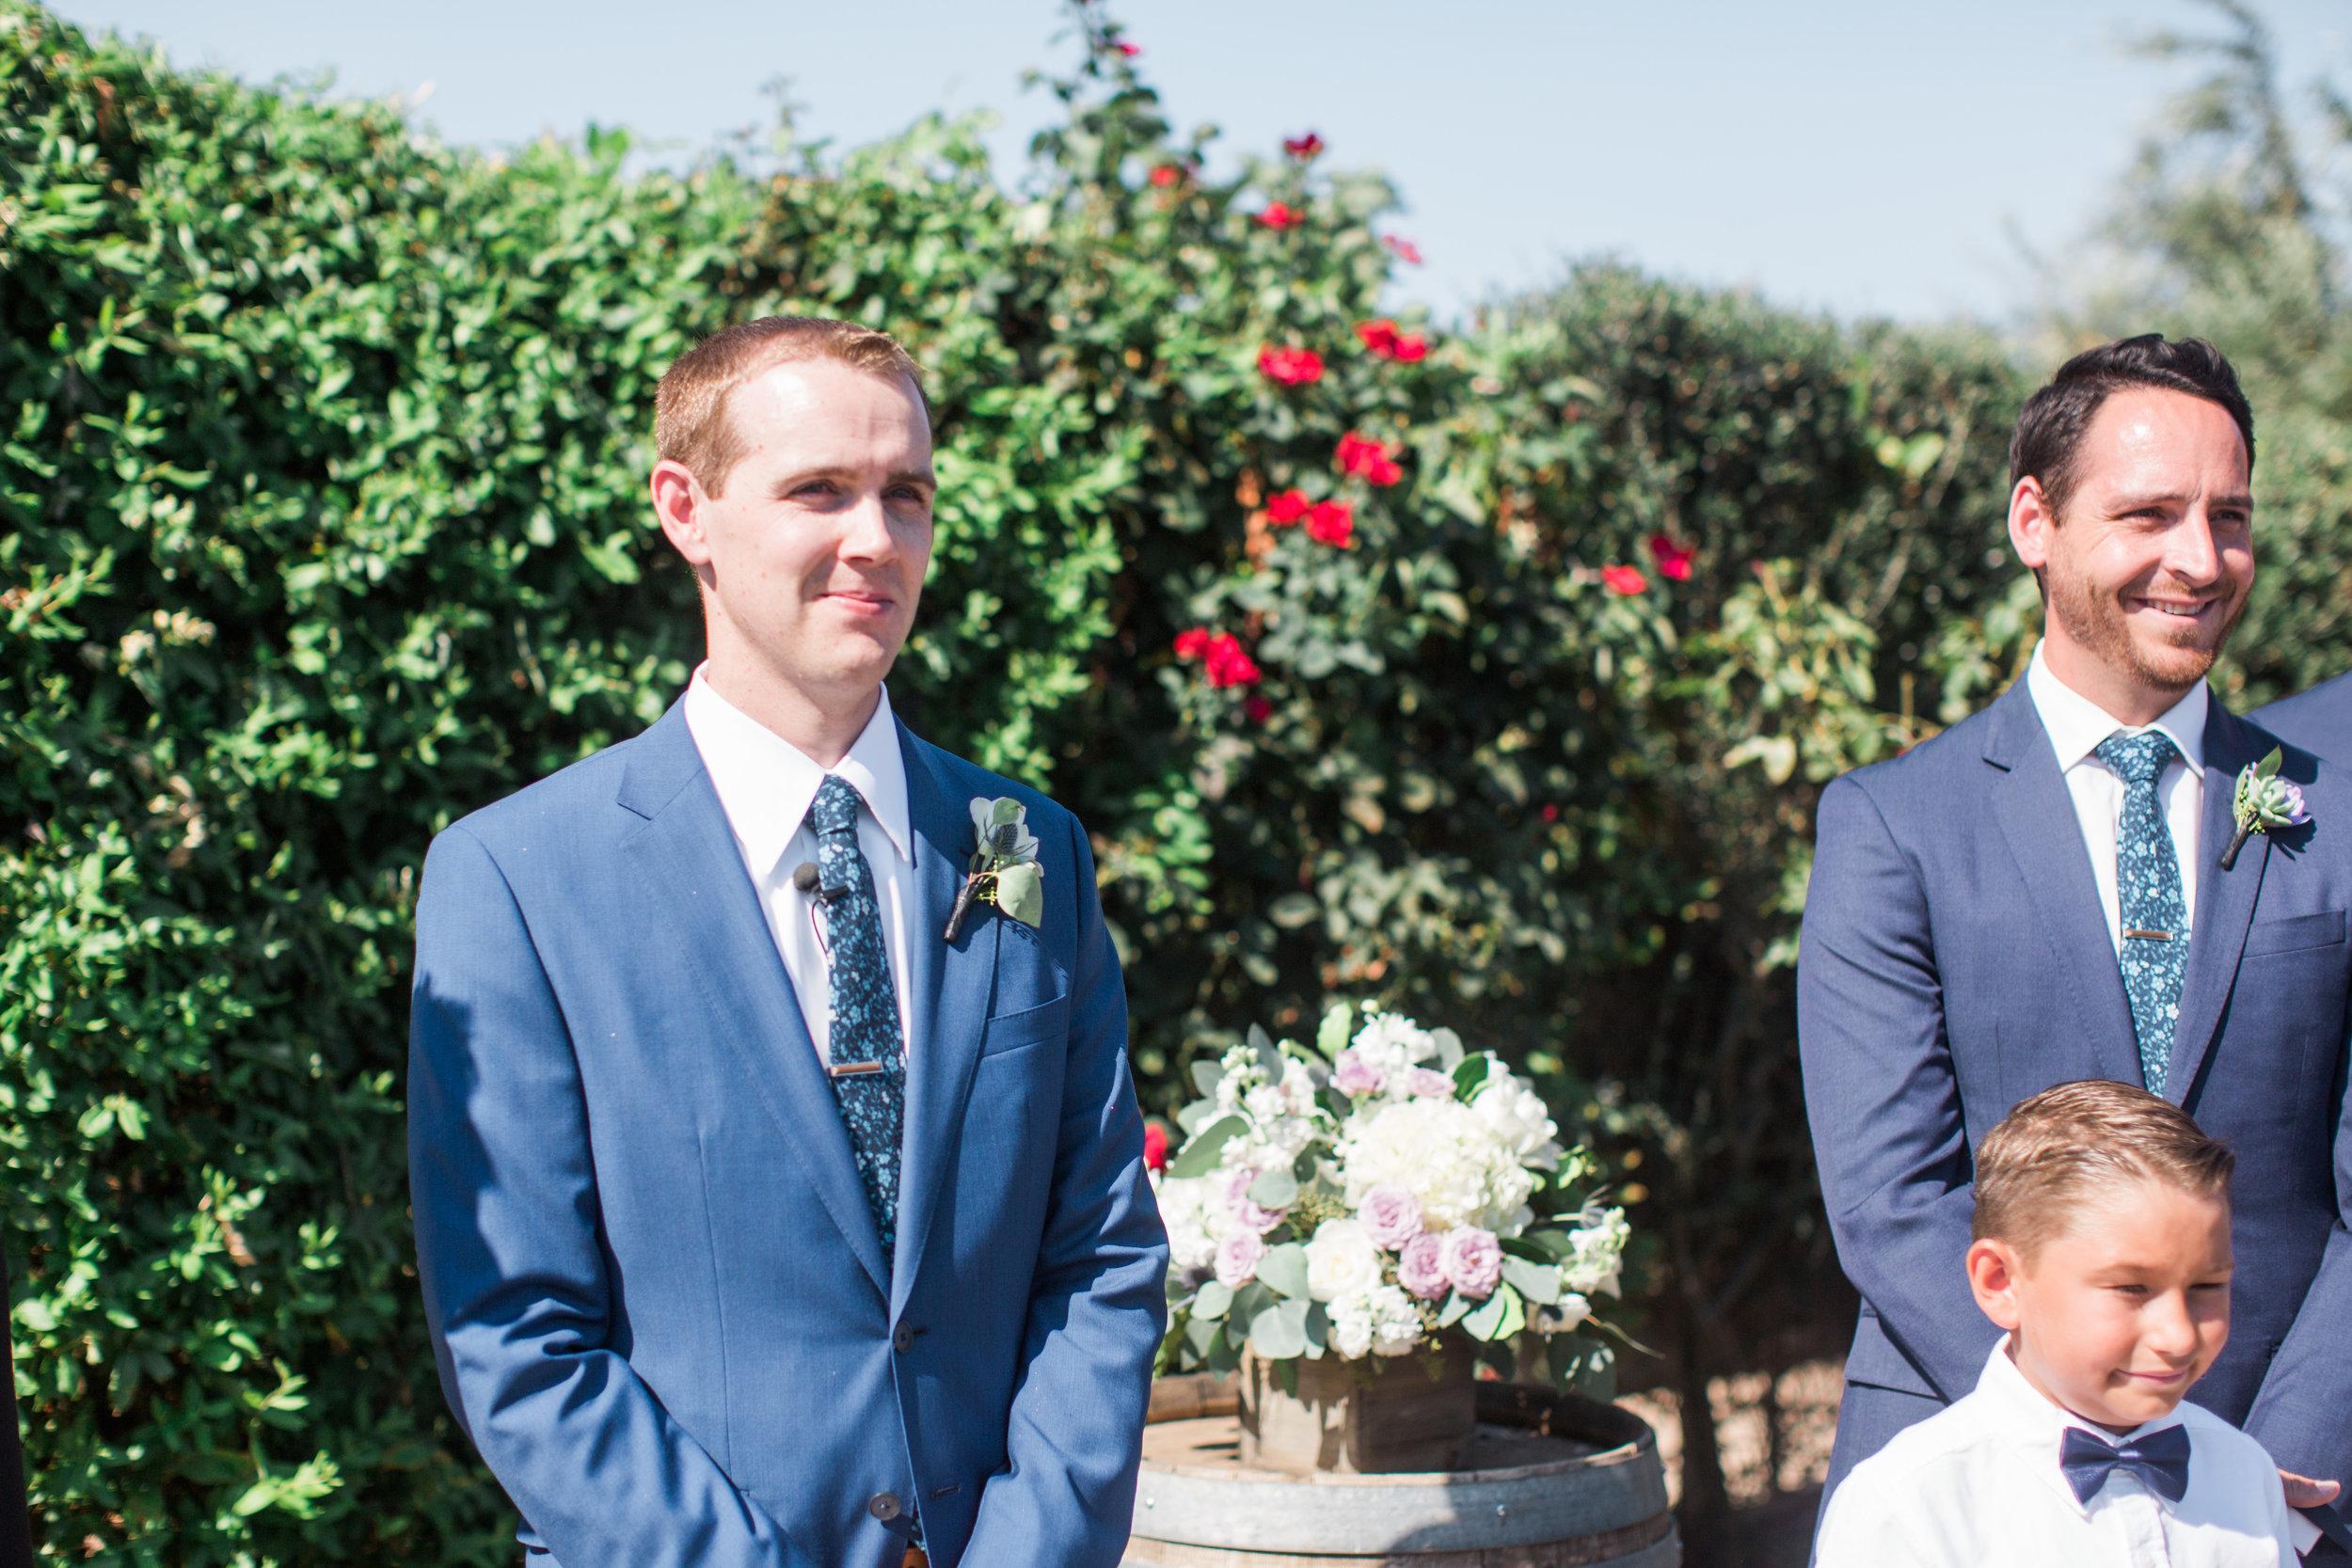 the-purple-orchid-resort-wedding-in-livermore-california-11.jpg